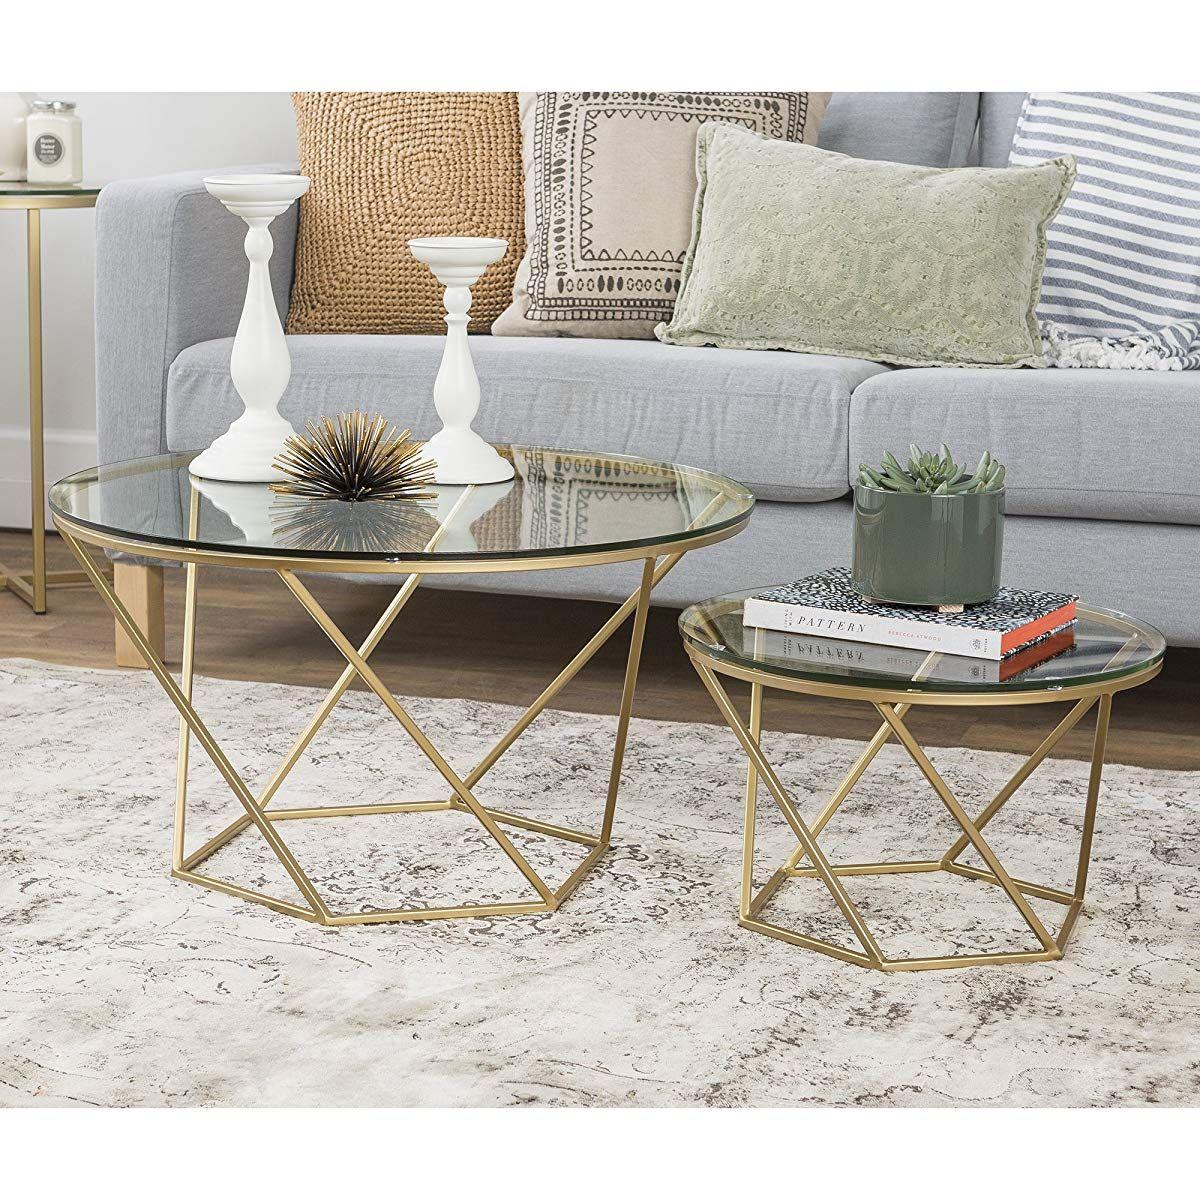 We Furniture Geometric Glass Nesting Coffee Tables Gold Glass Gold Nesting Coffee Tables Gold Coffee Table Coffee Table